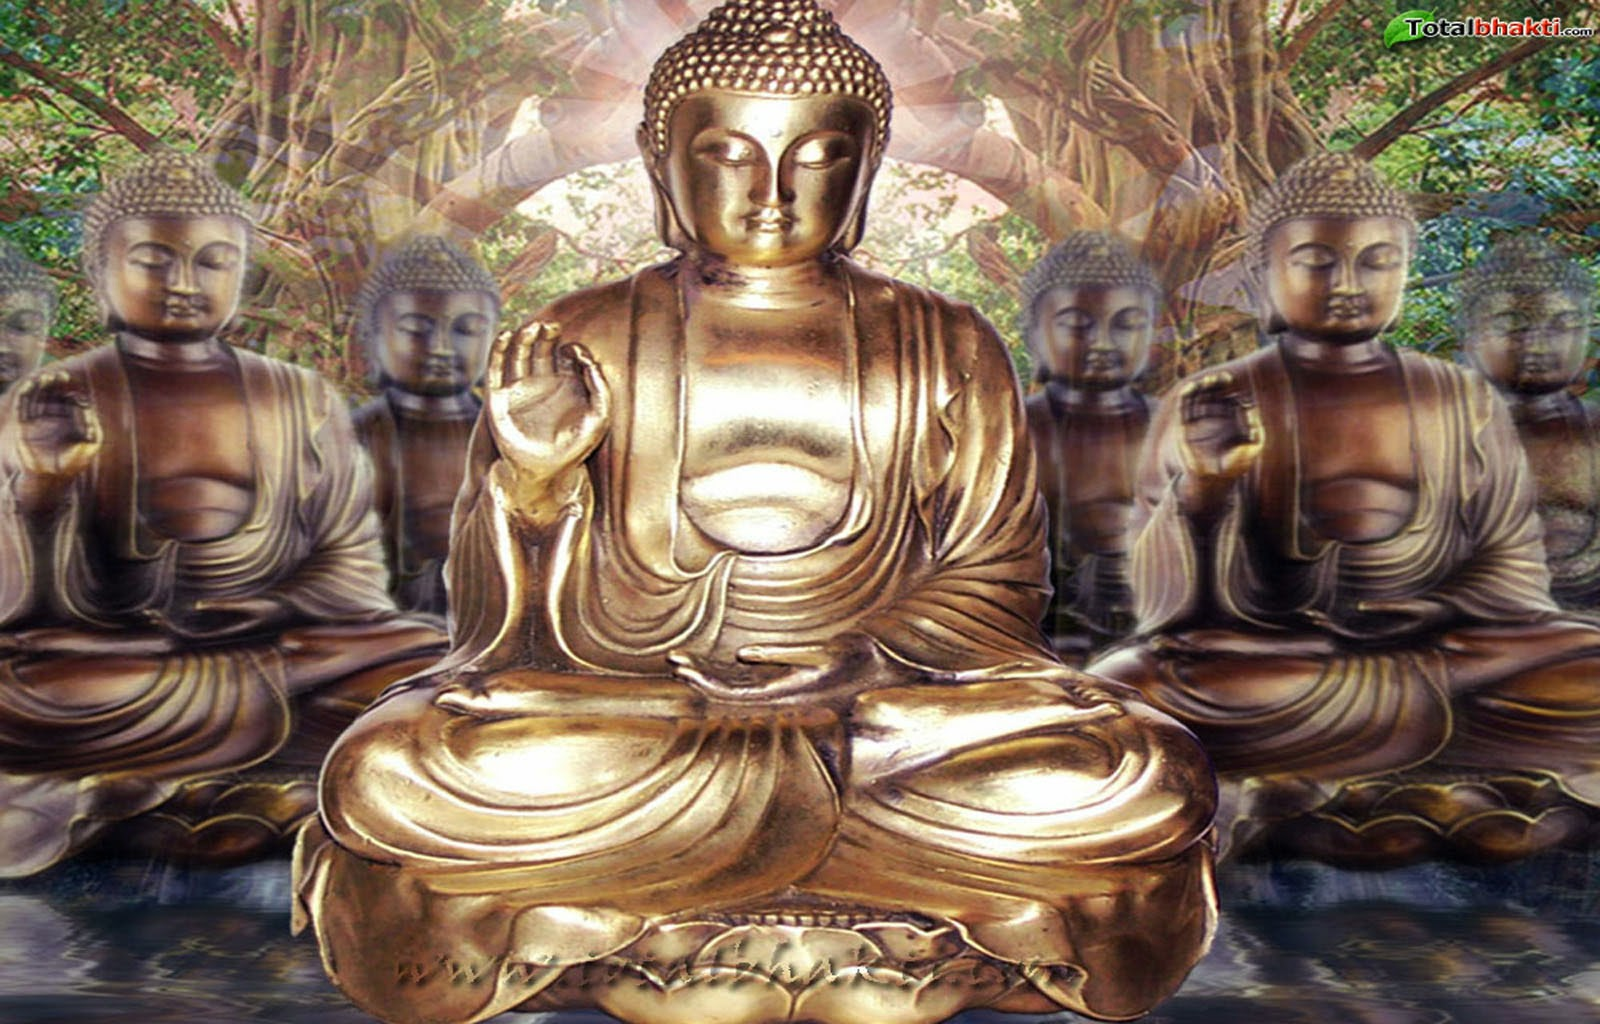 Bhagwan Ji Help Me Lord Gautam Buddha Wallpapers Gallery Part Ii